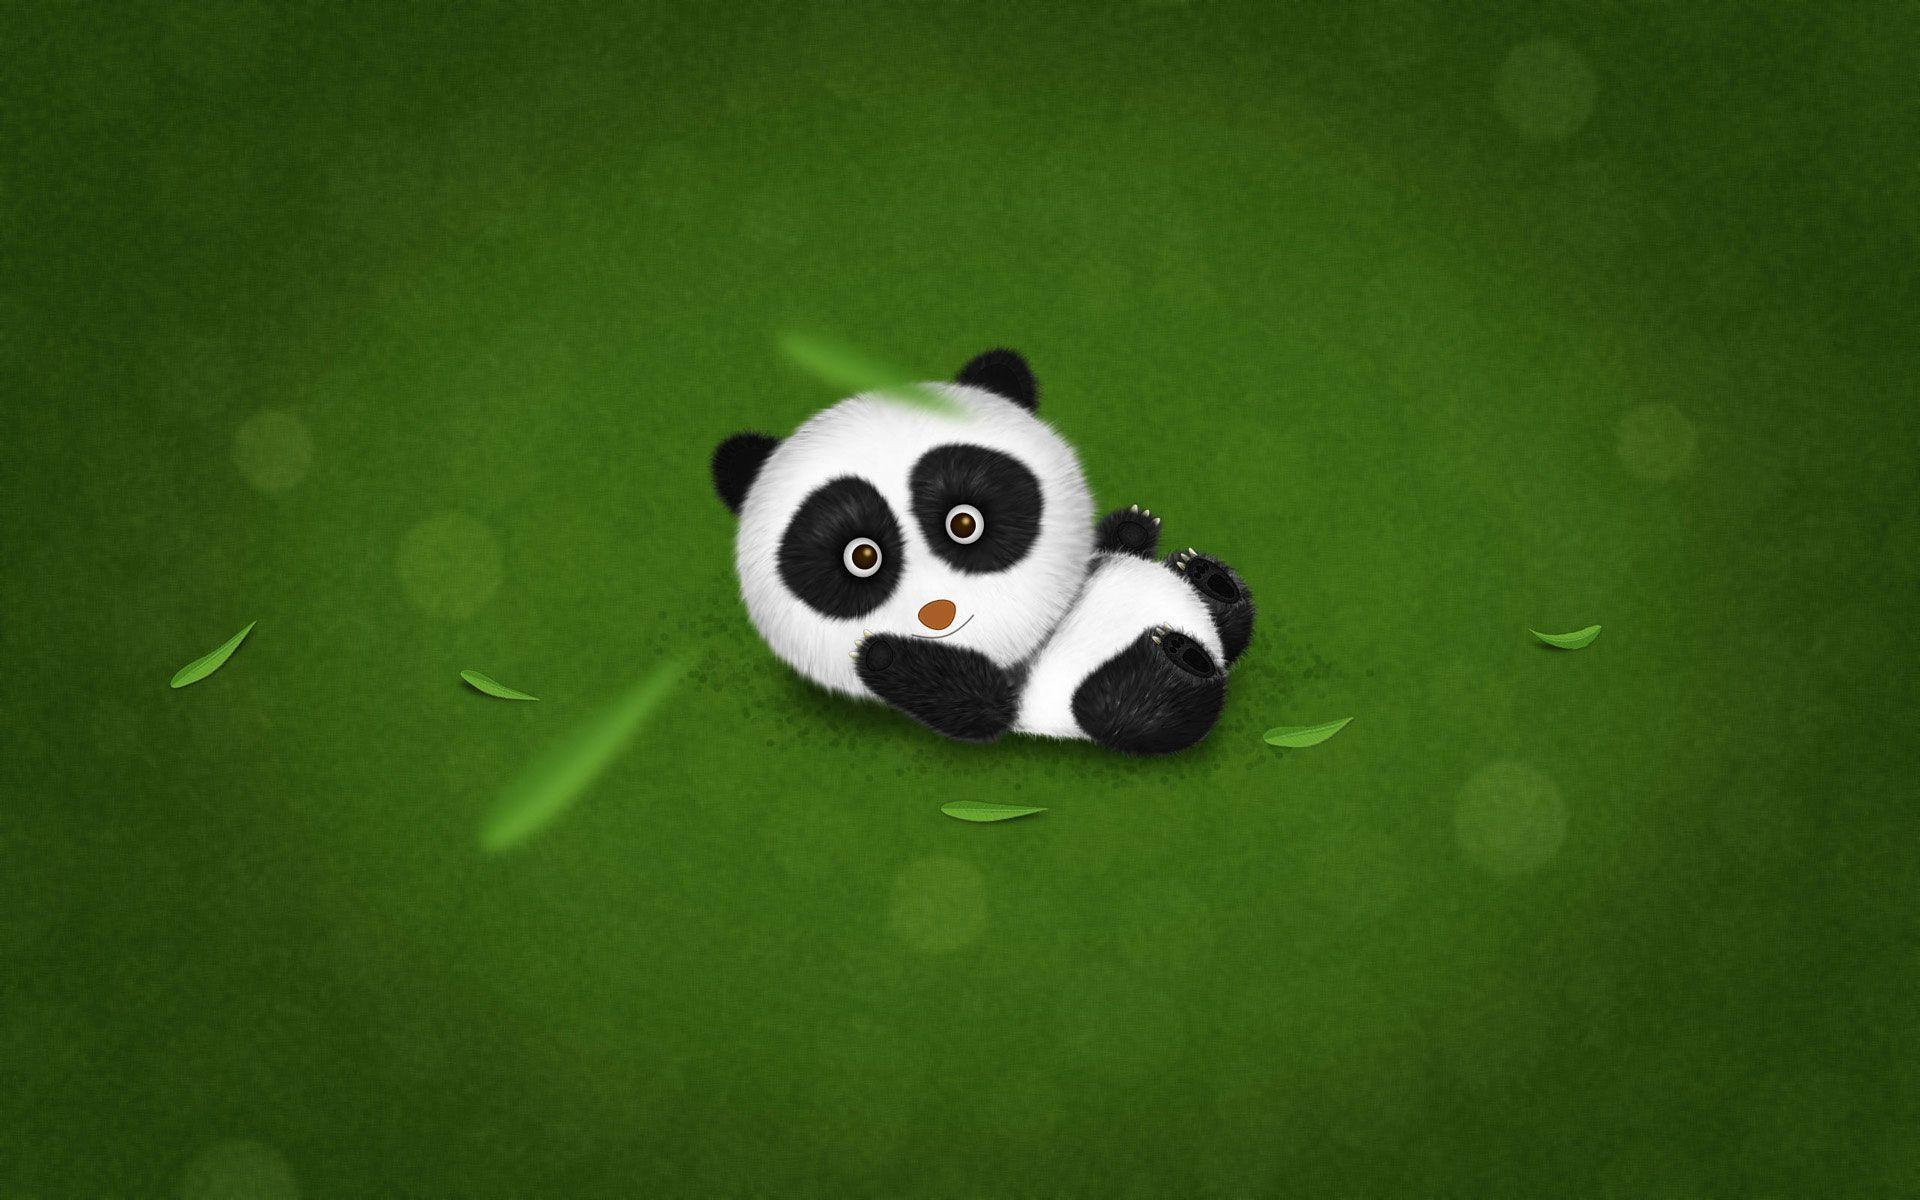 Cute Panda Backgrounds  Wallpaper Cave